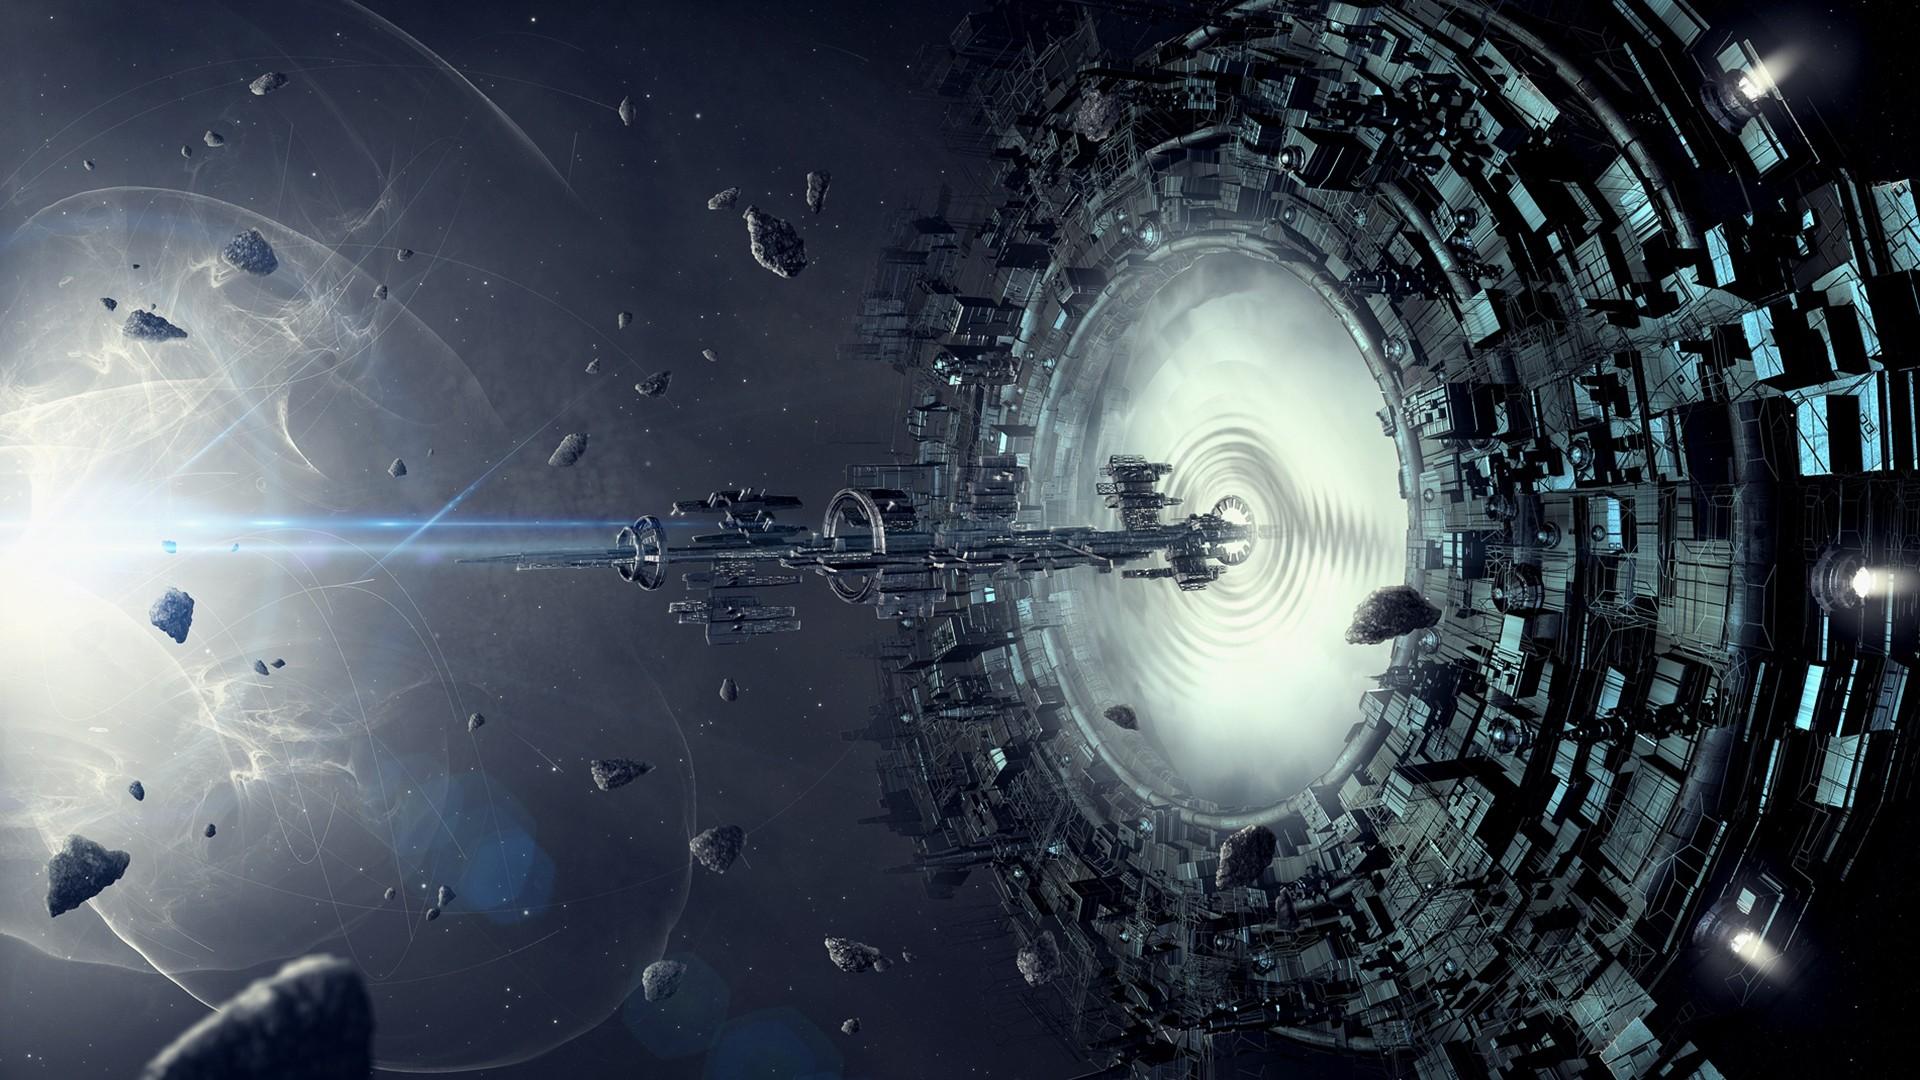 spaceship hd wallpapers 1080p